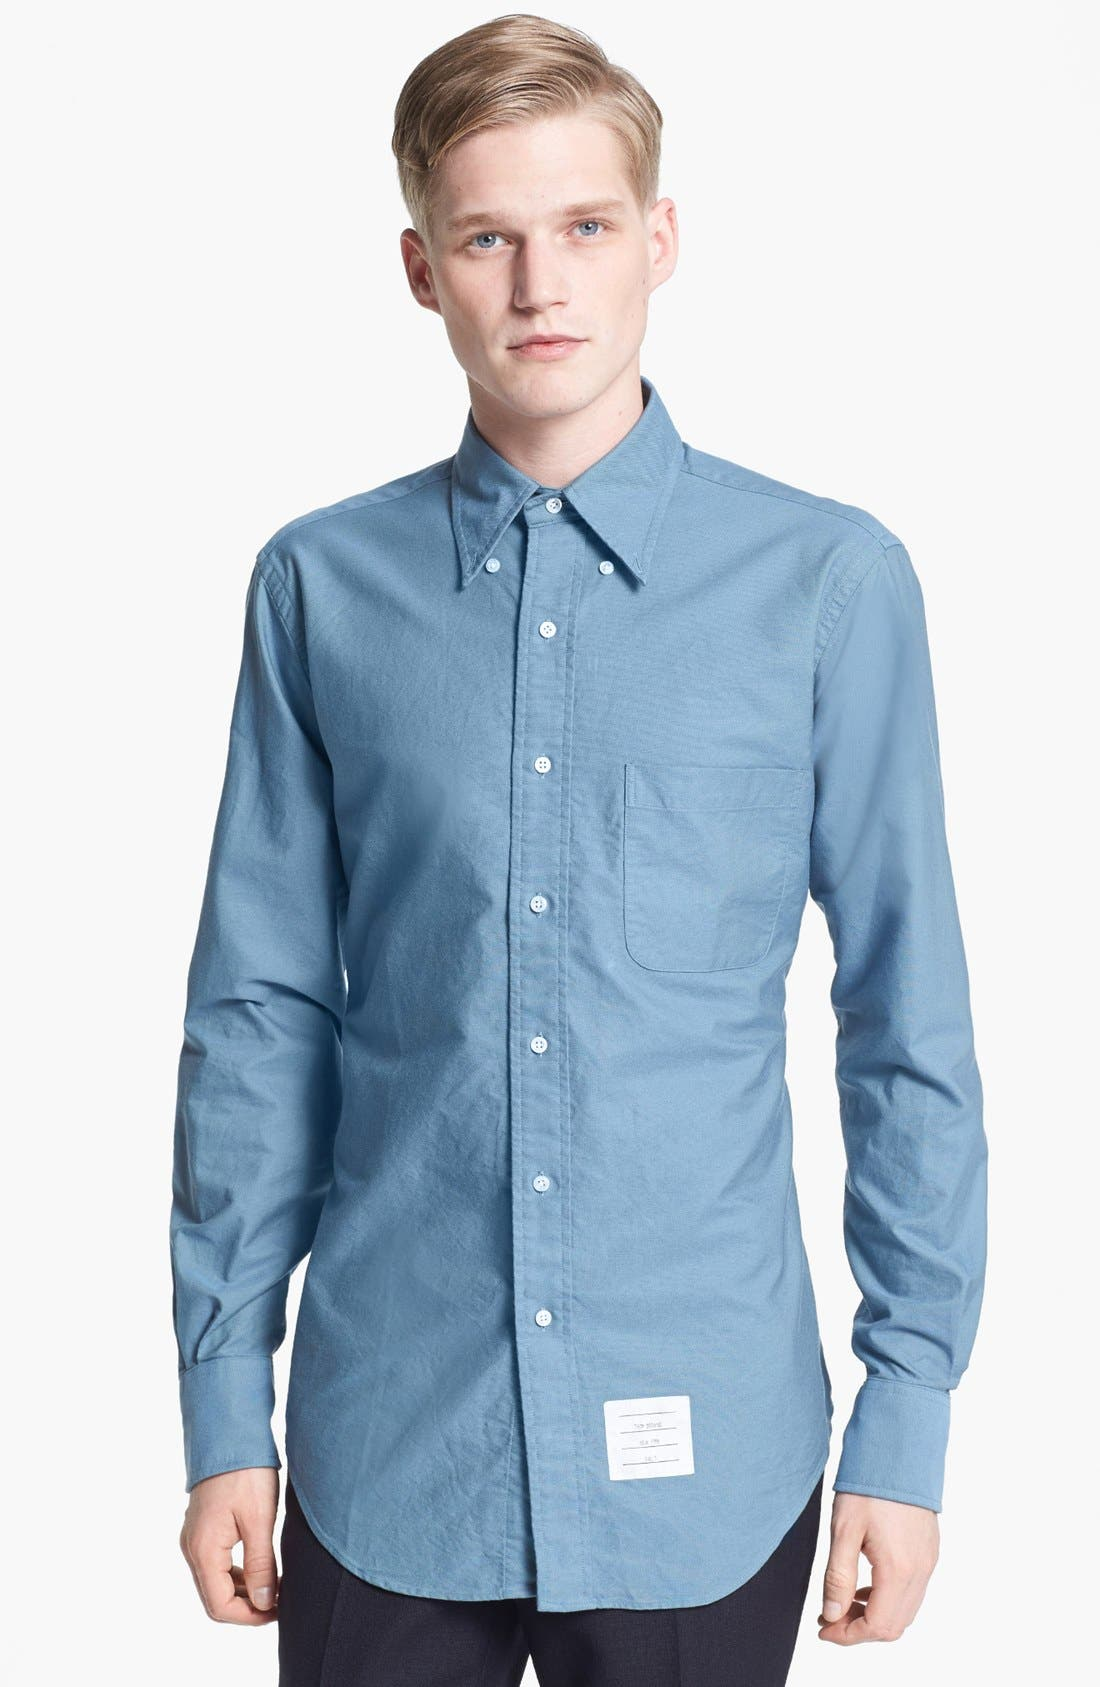 Alternate Image 1 Selected - Thom Browne Oxford Shirt